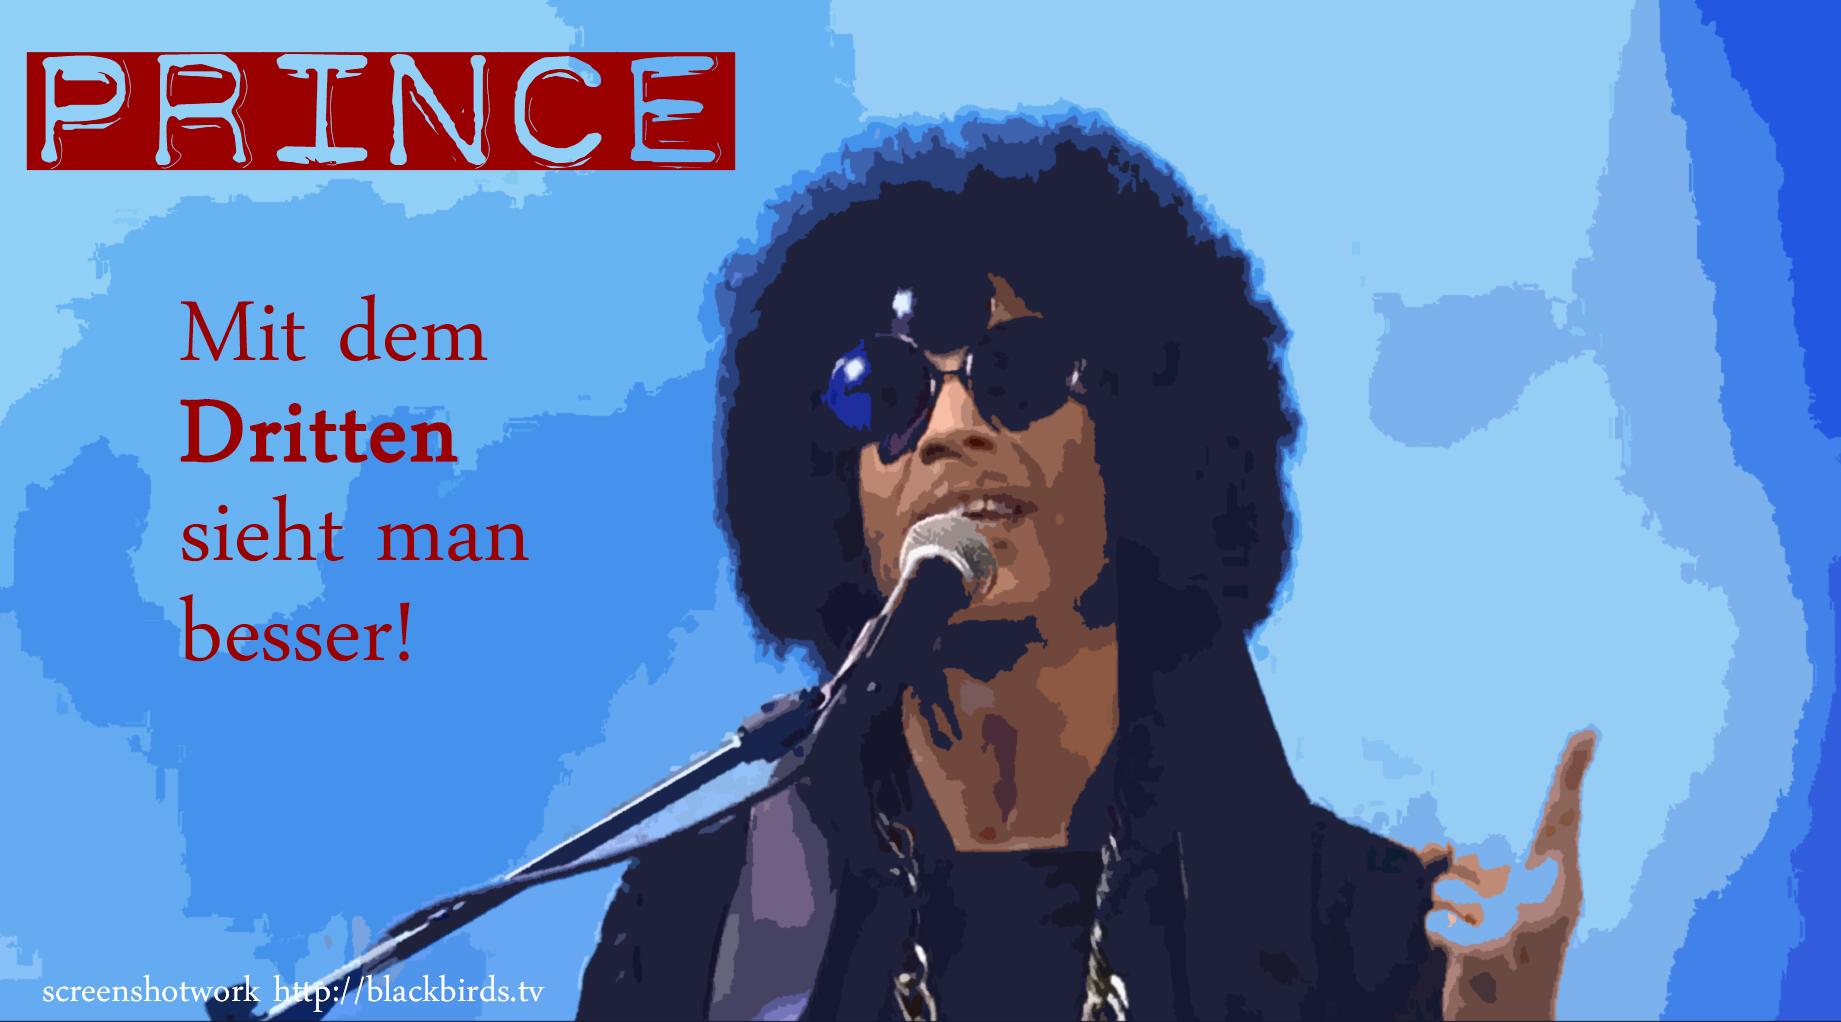 Prince_Musikerwitz